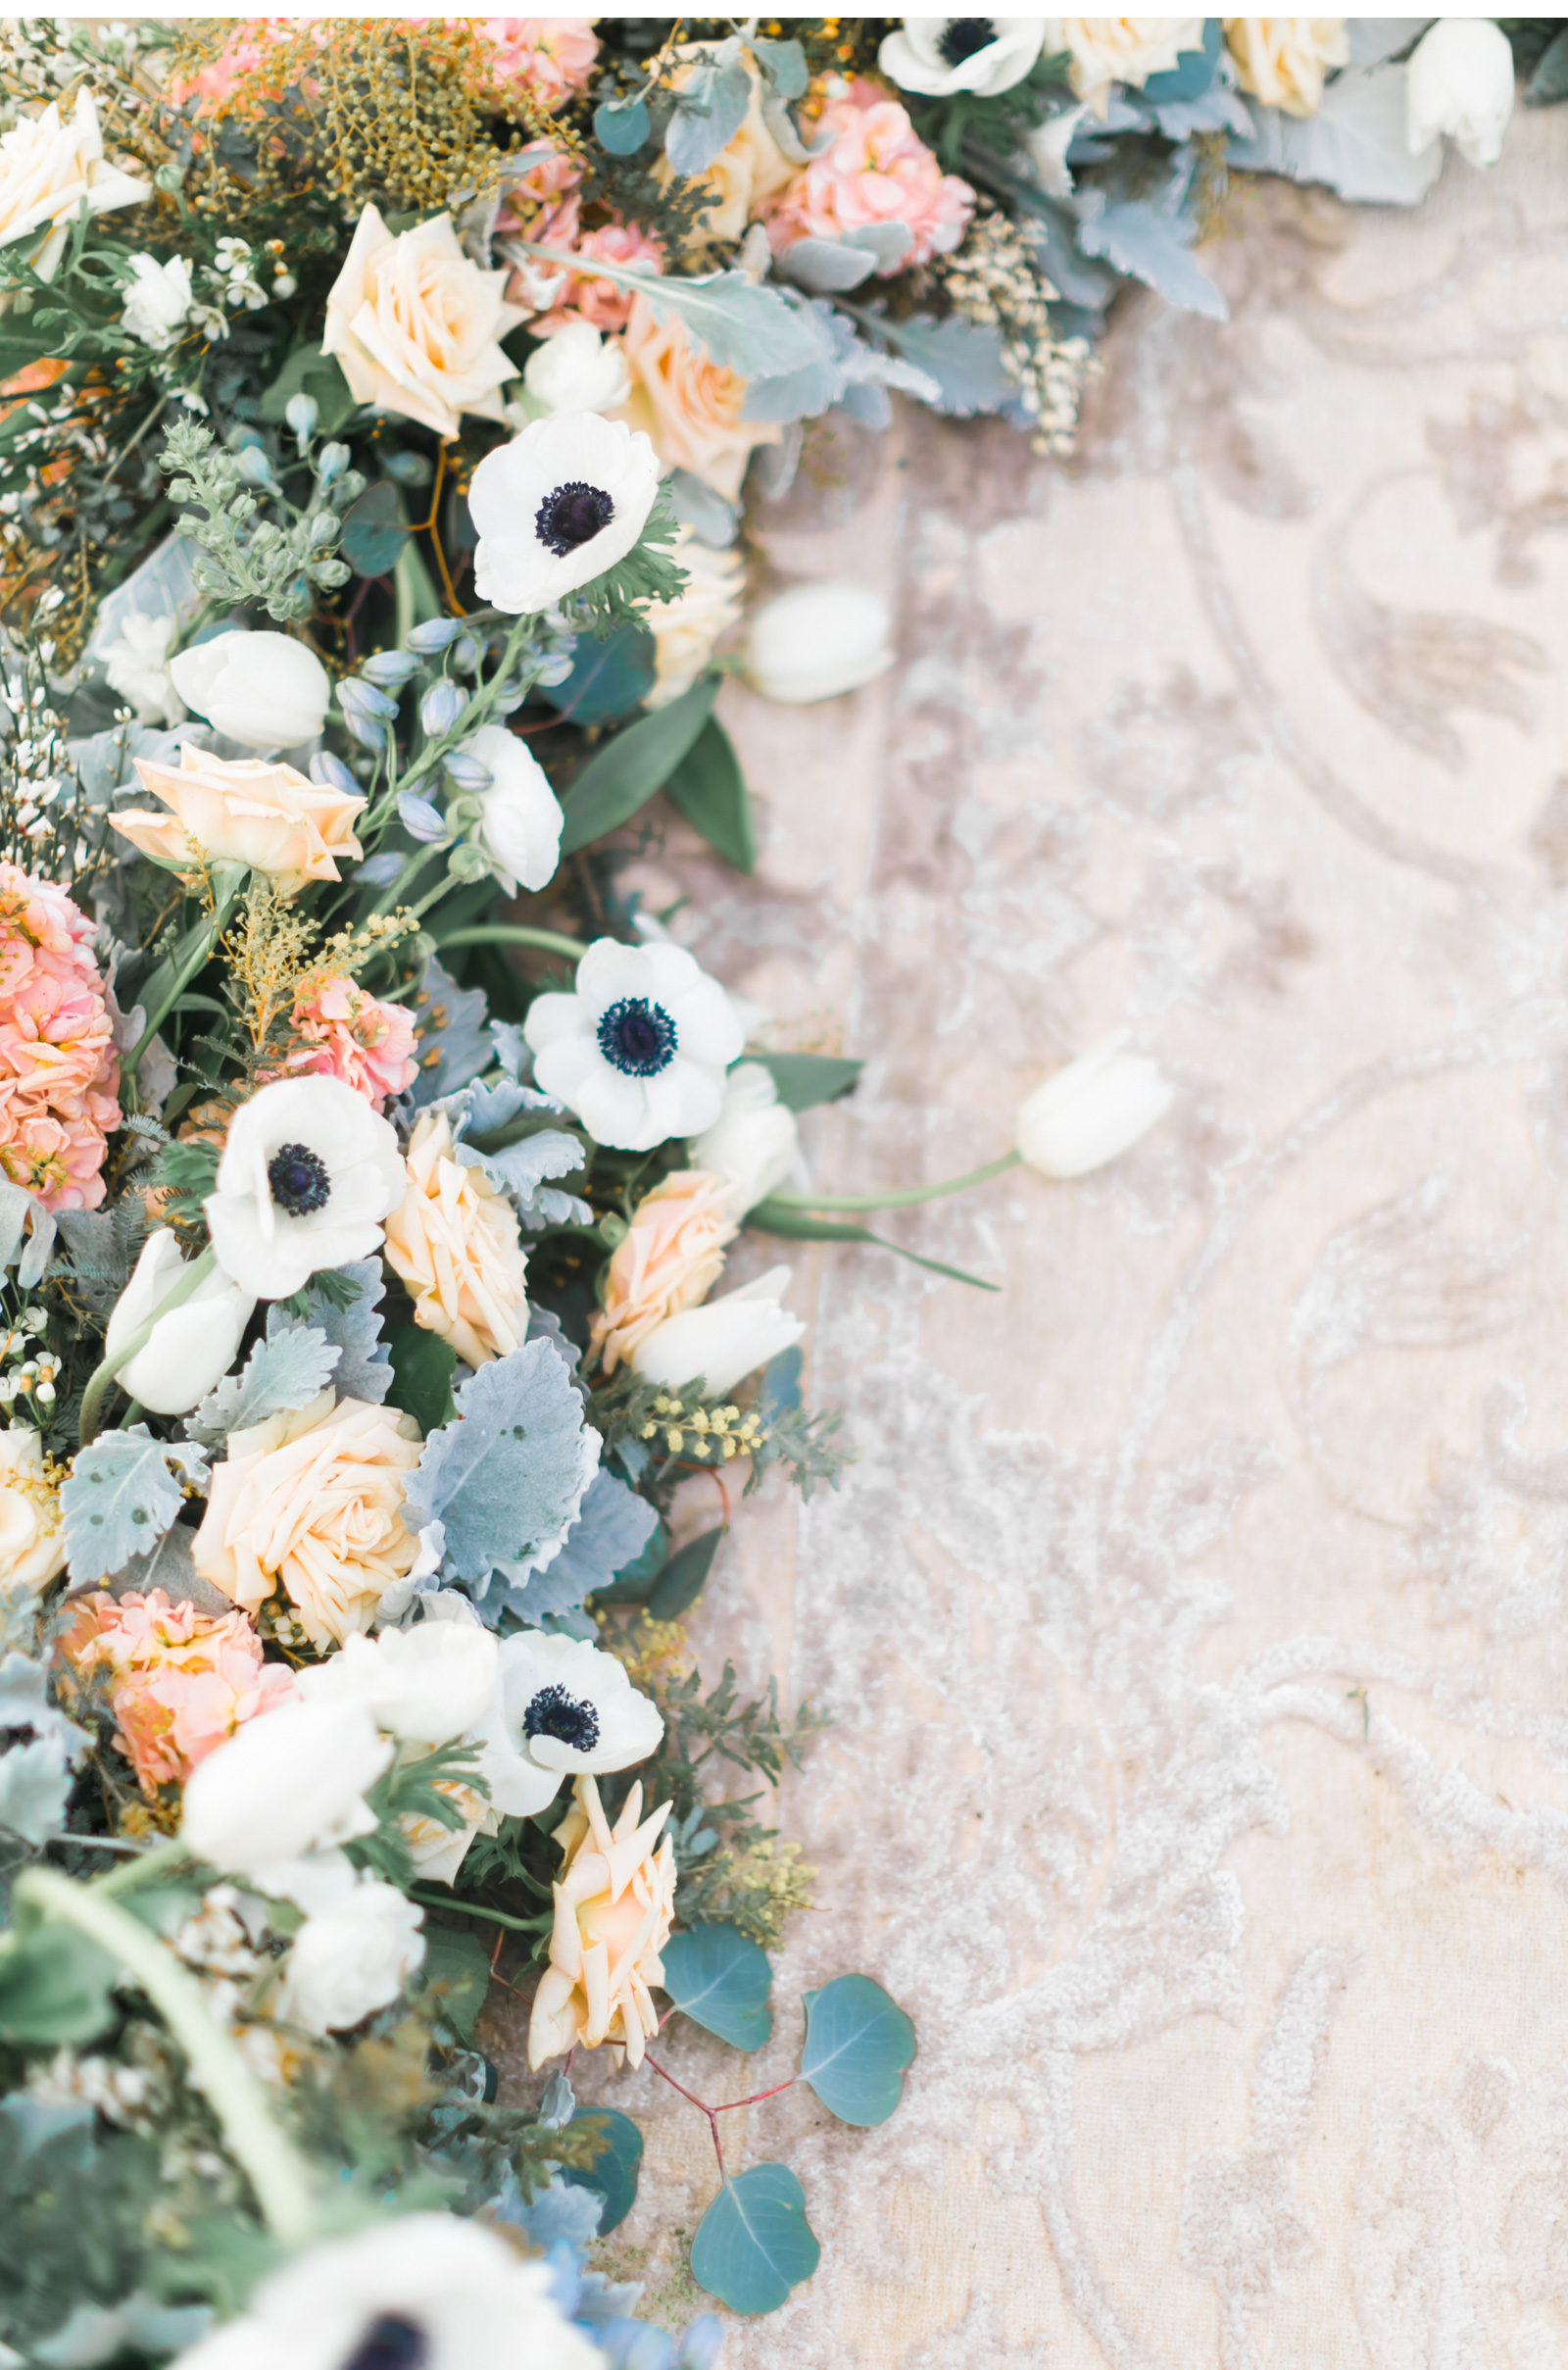 Fine-Art-Santa-Barbara-Wedding-Natalie-Schutt-Photography_08.jpg